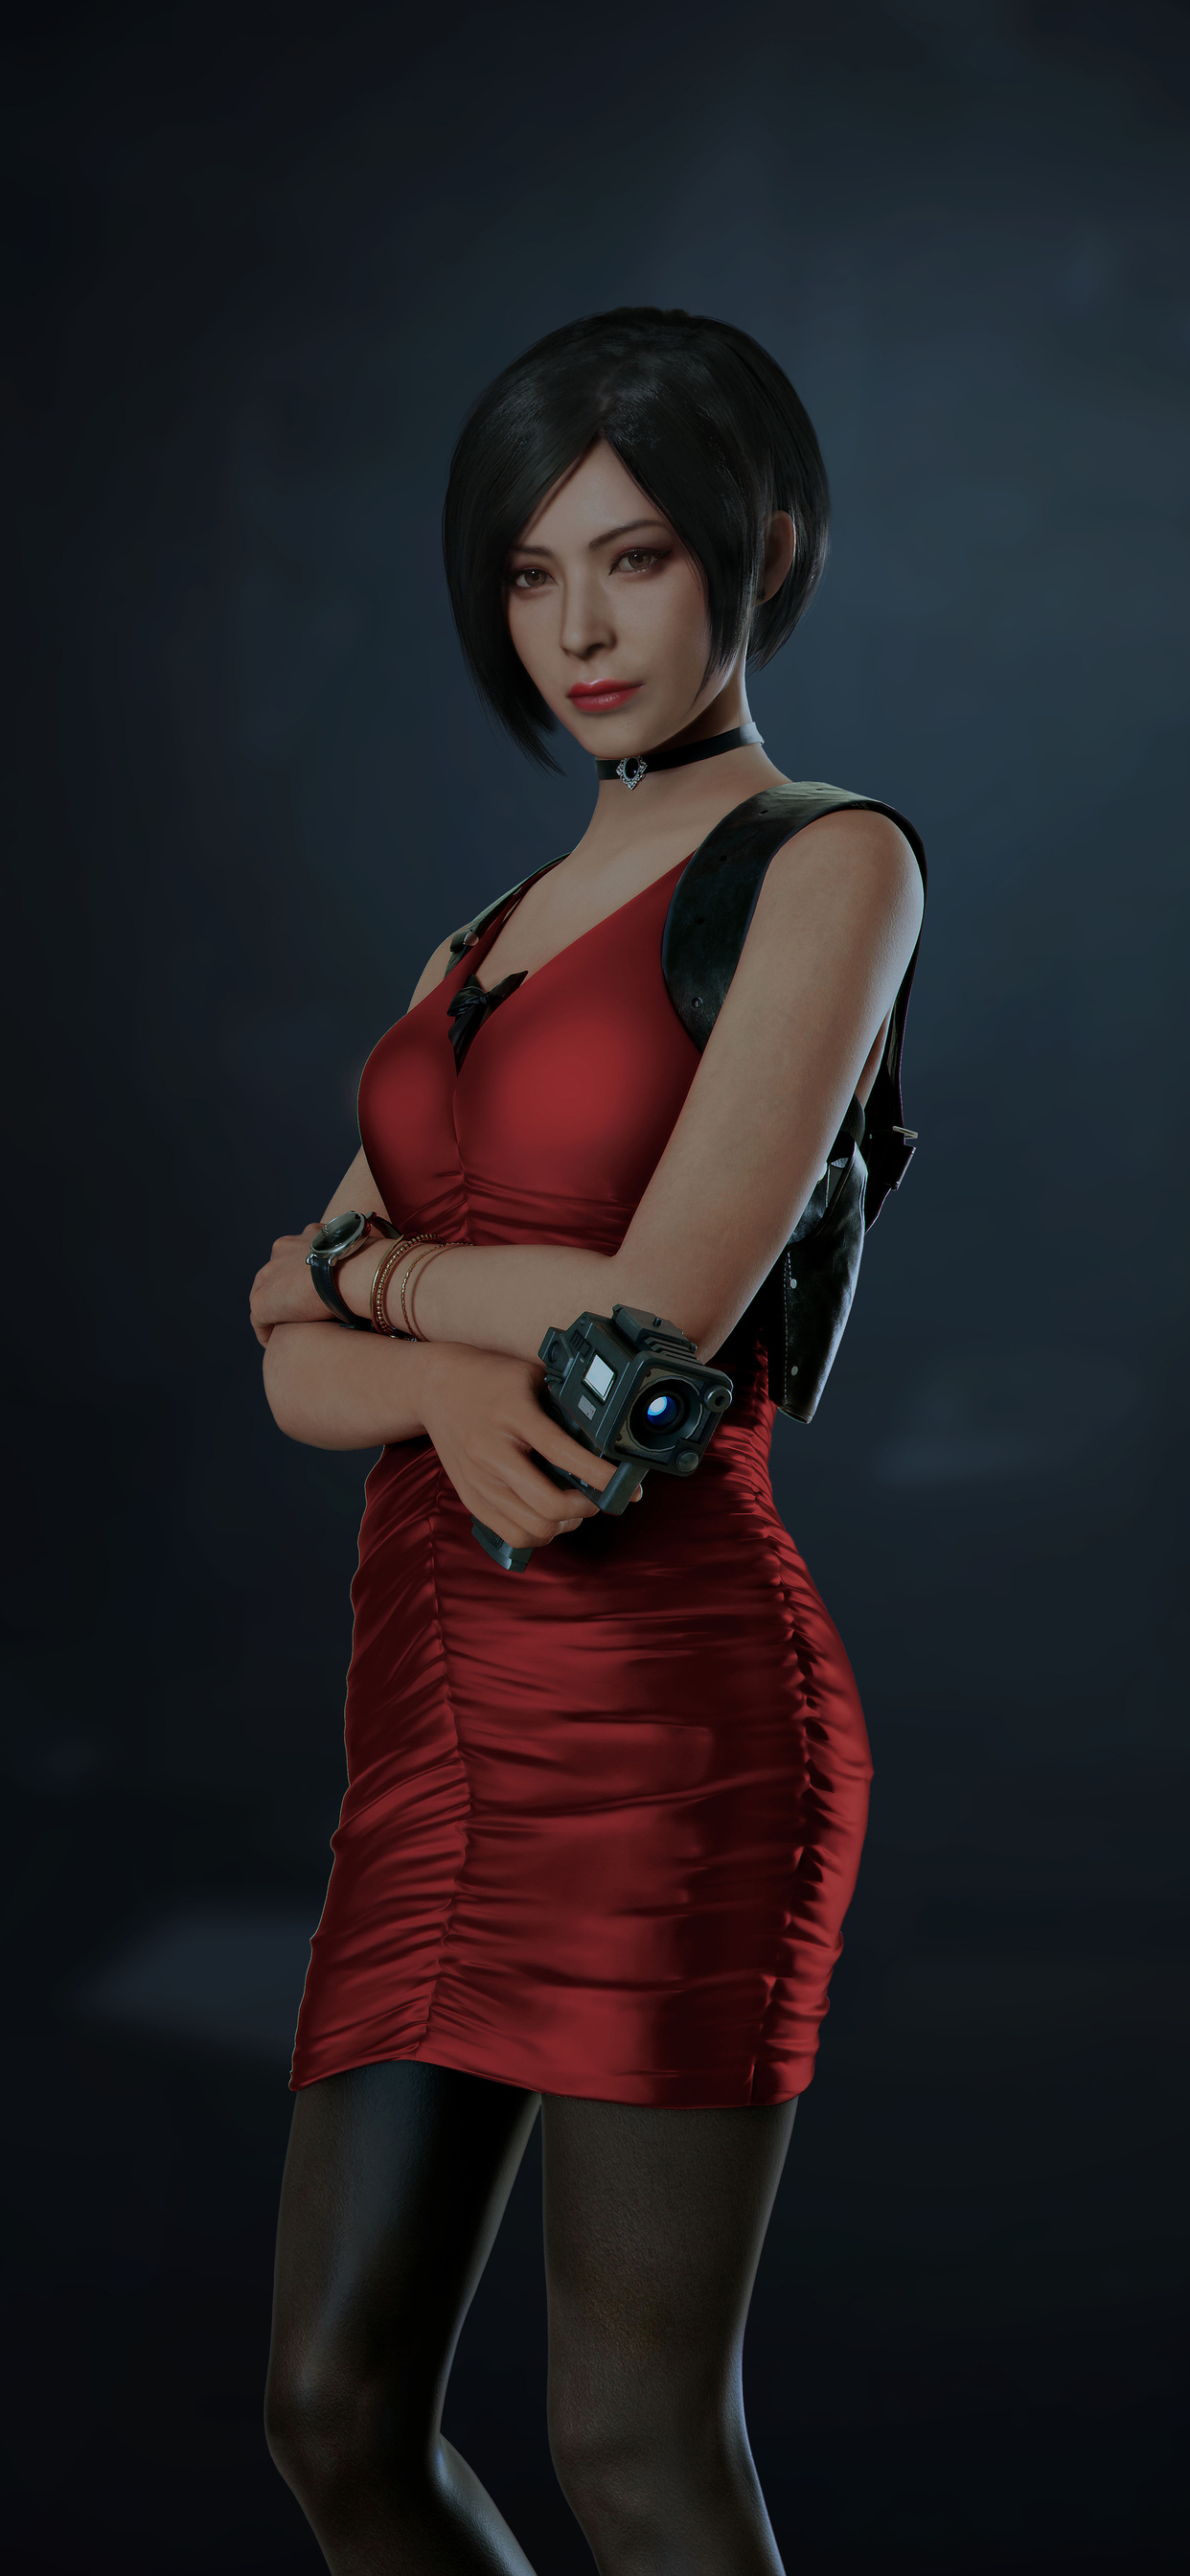 1242x2688 Ada Wong Resident Evil 2 5k Iphone XS MAX HD 4k ...